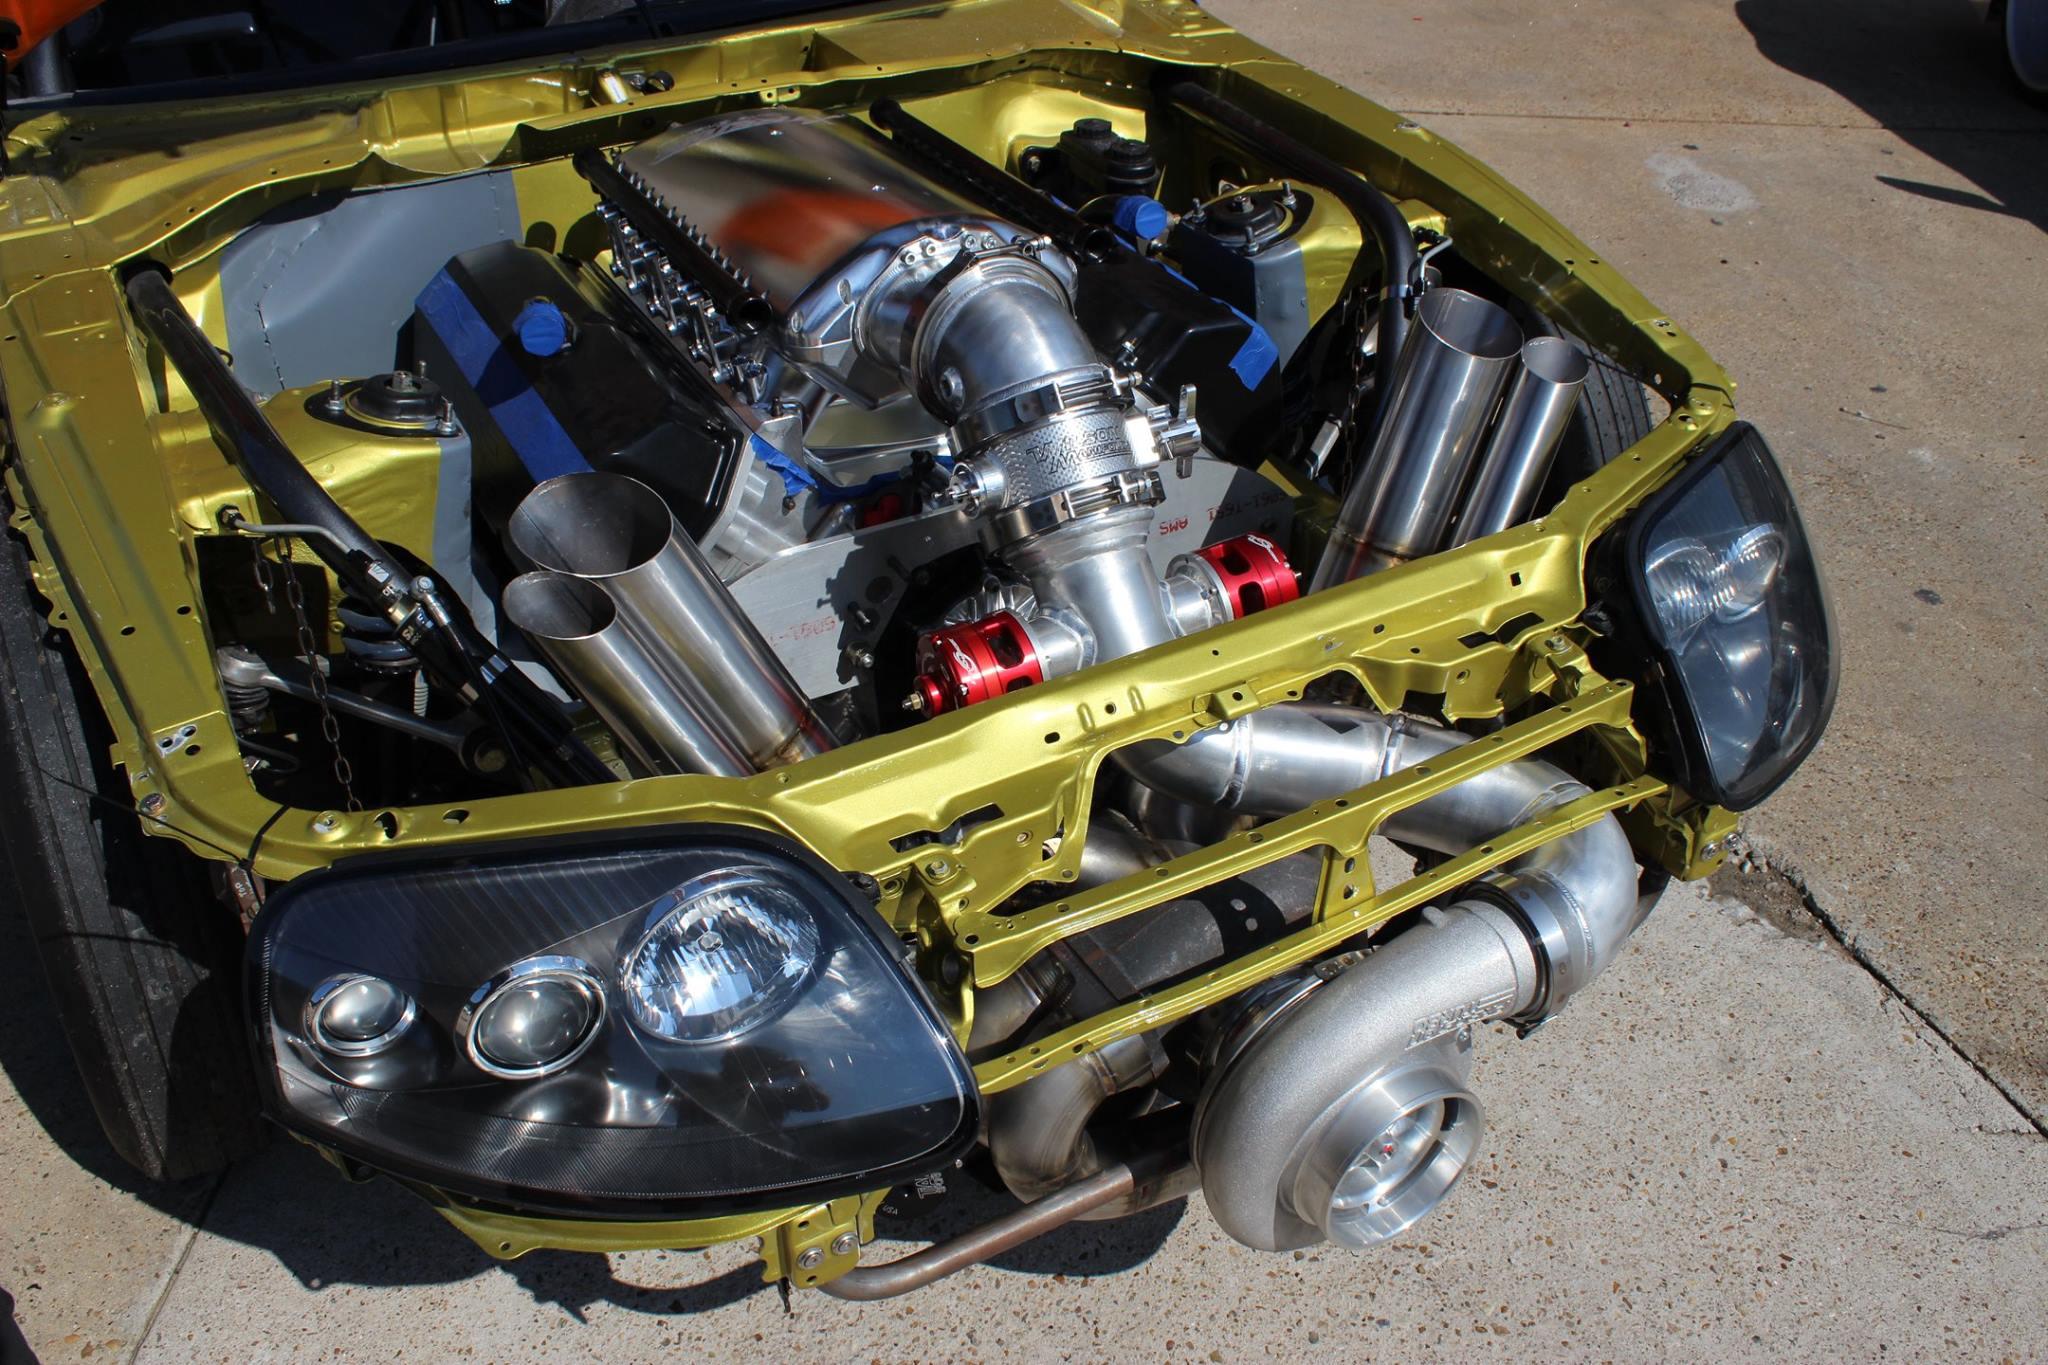 Hemi Swap Wiring Harness Real Diagram Toyota Supera Supra With A Turbo V8 Engine Depot 61 64